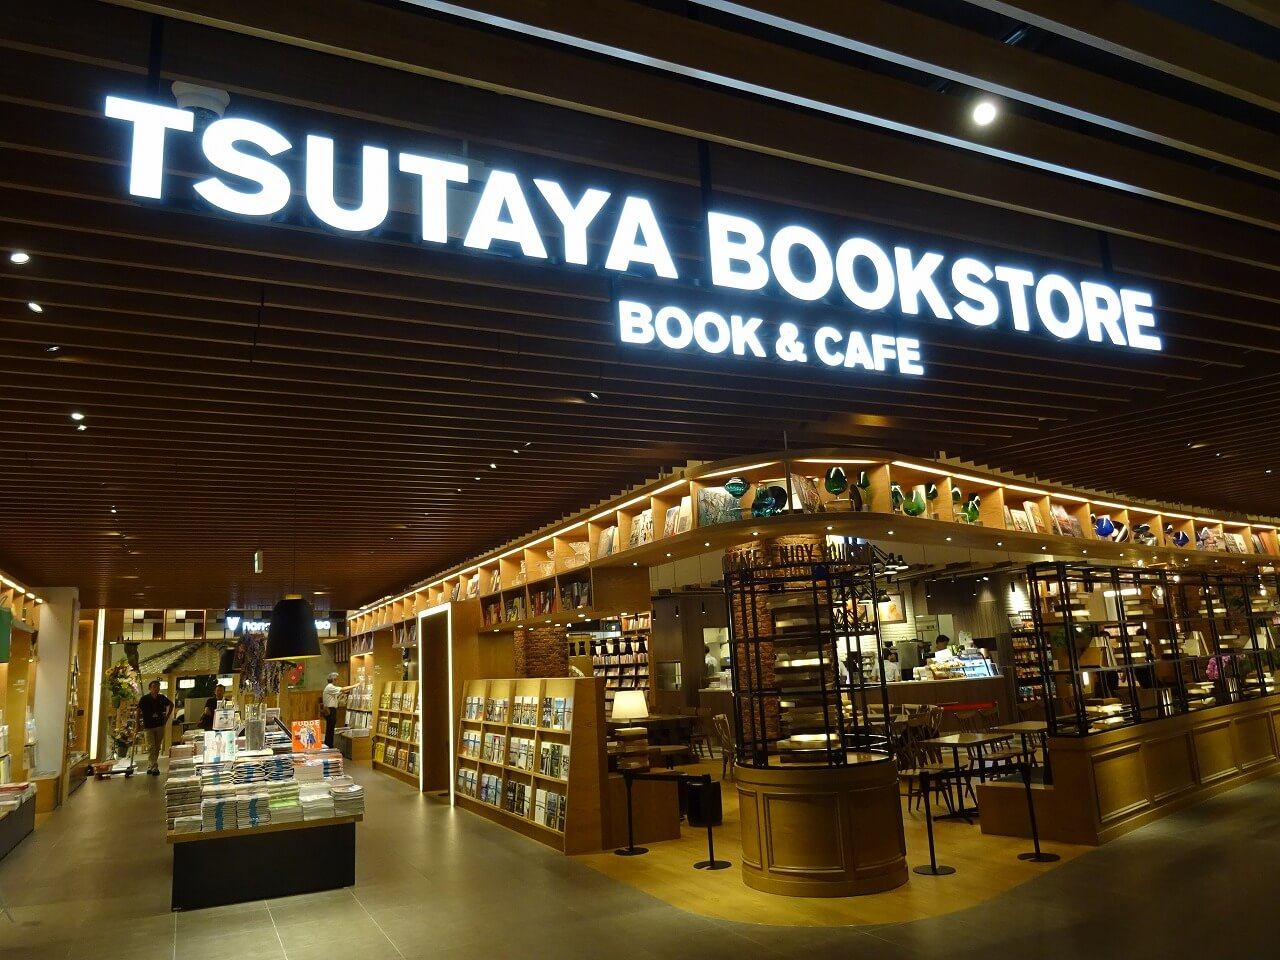 tsutaya-bookstore-mirai-nagasaki-cocowalk